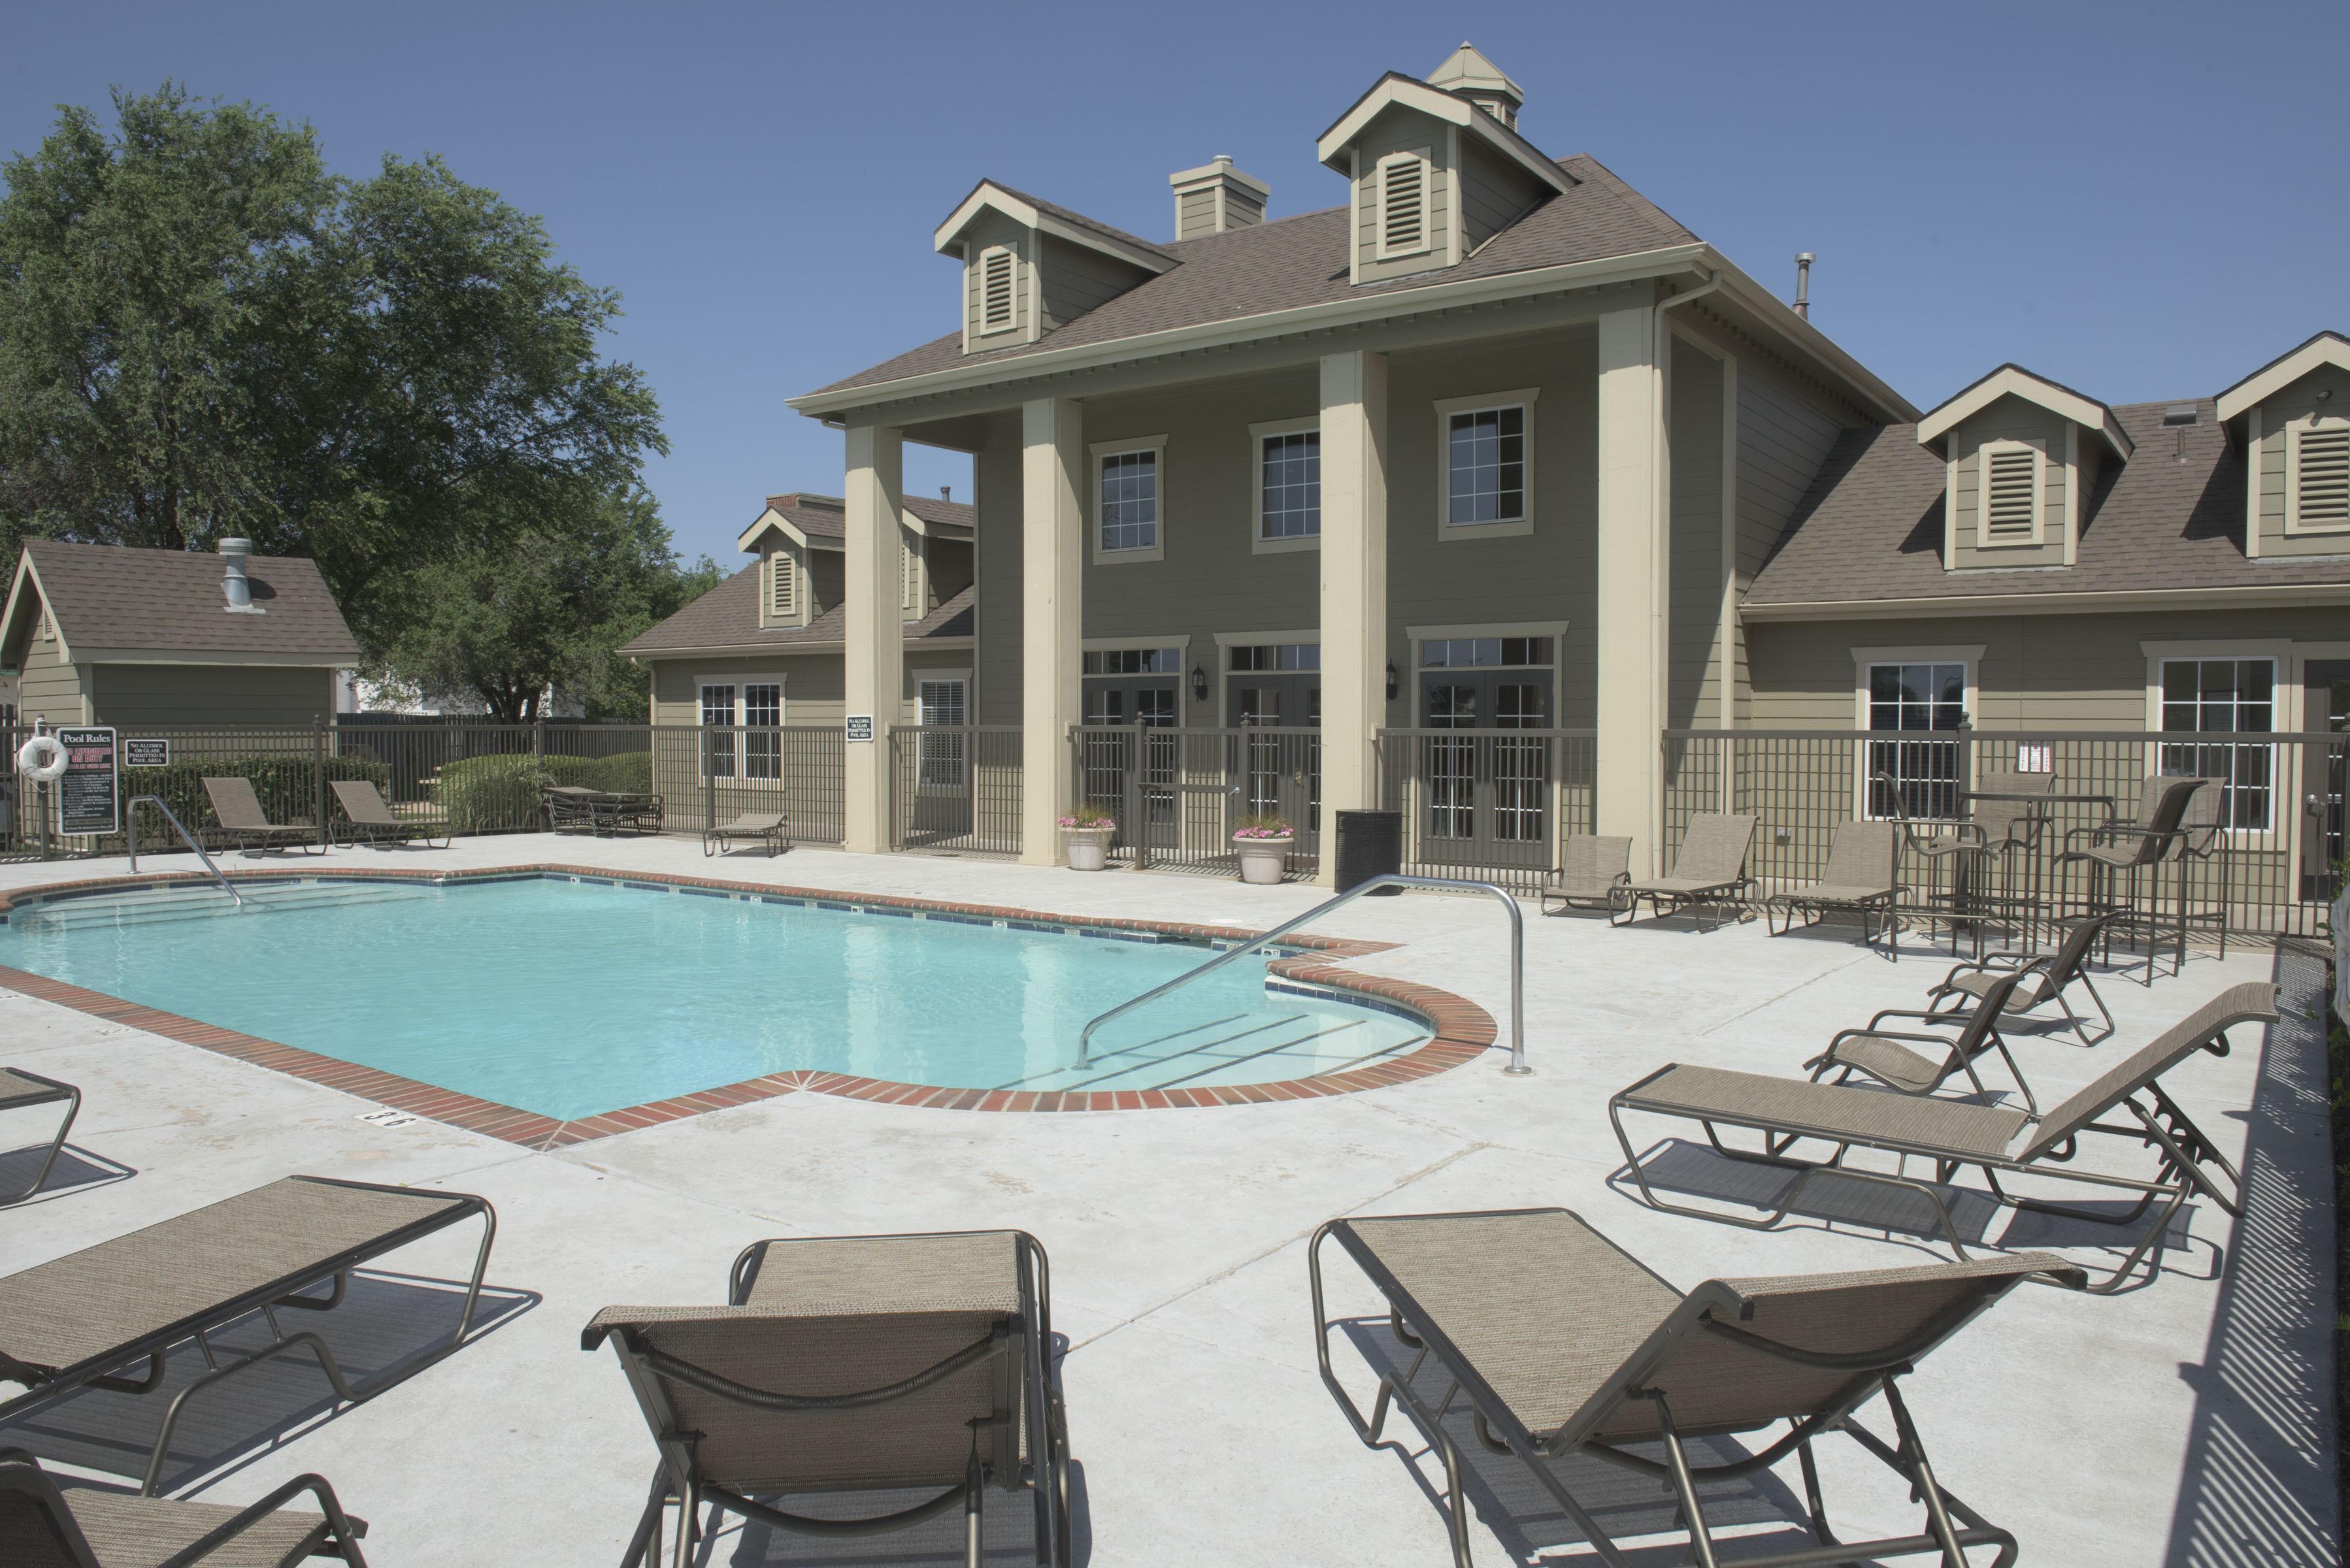 Apartments Near Friends Newport Wichita Apts. for Friends University Students in Wichita, KS